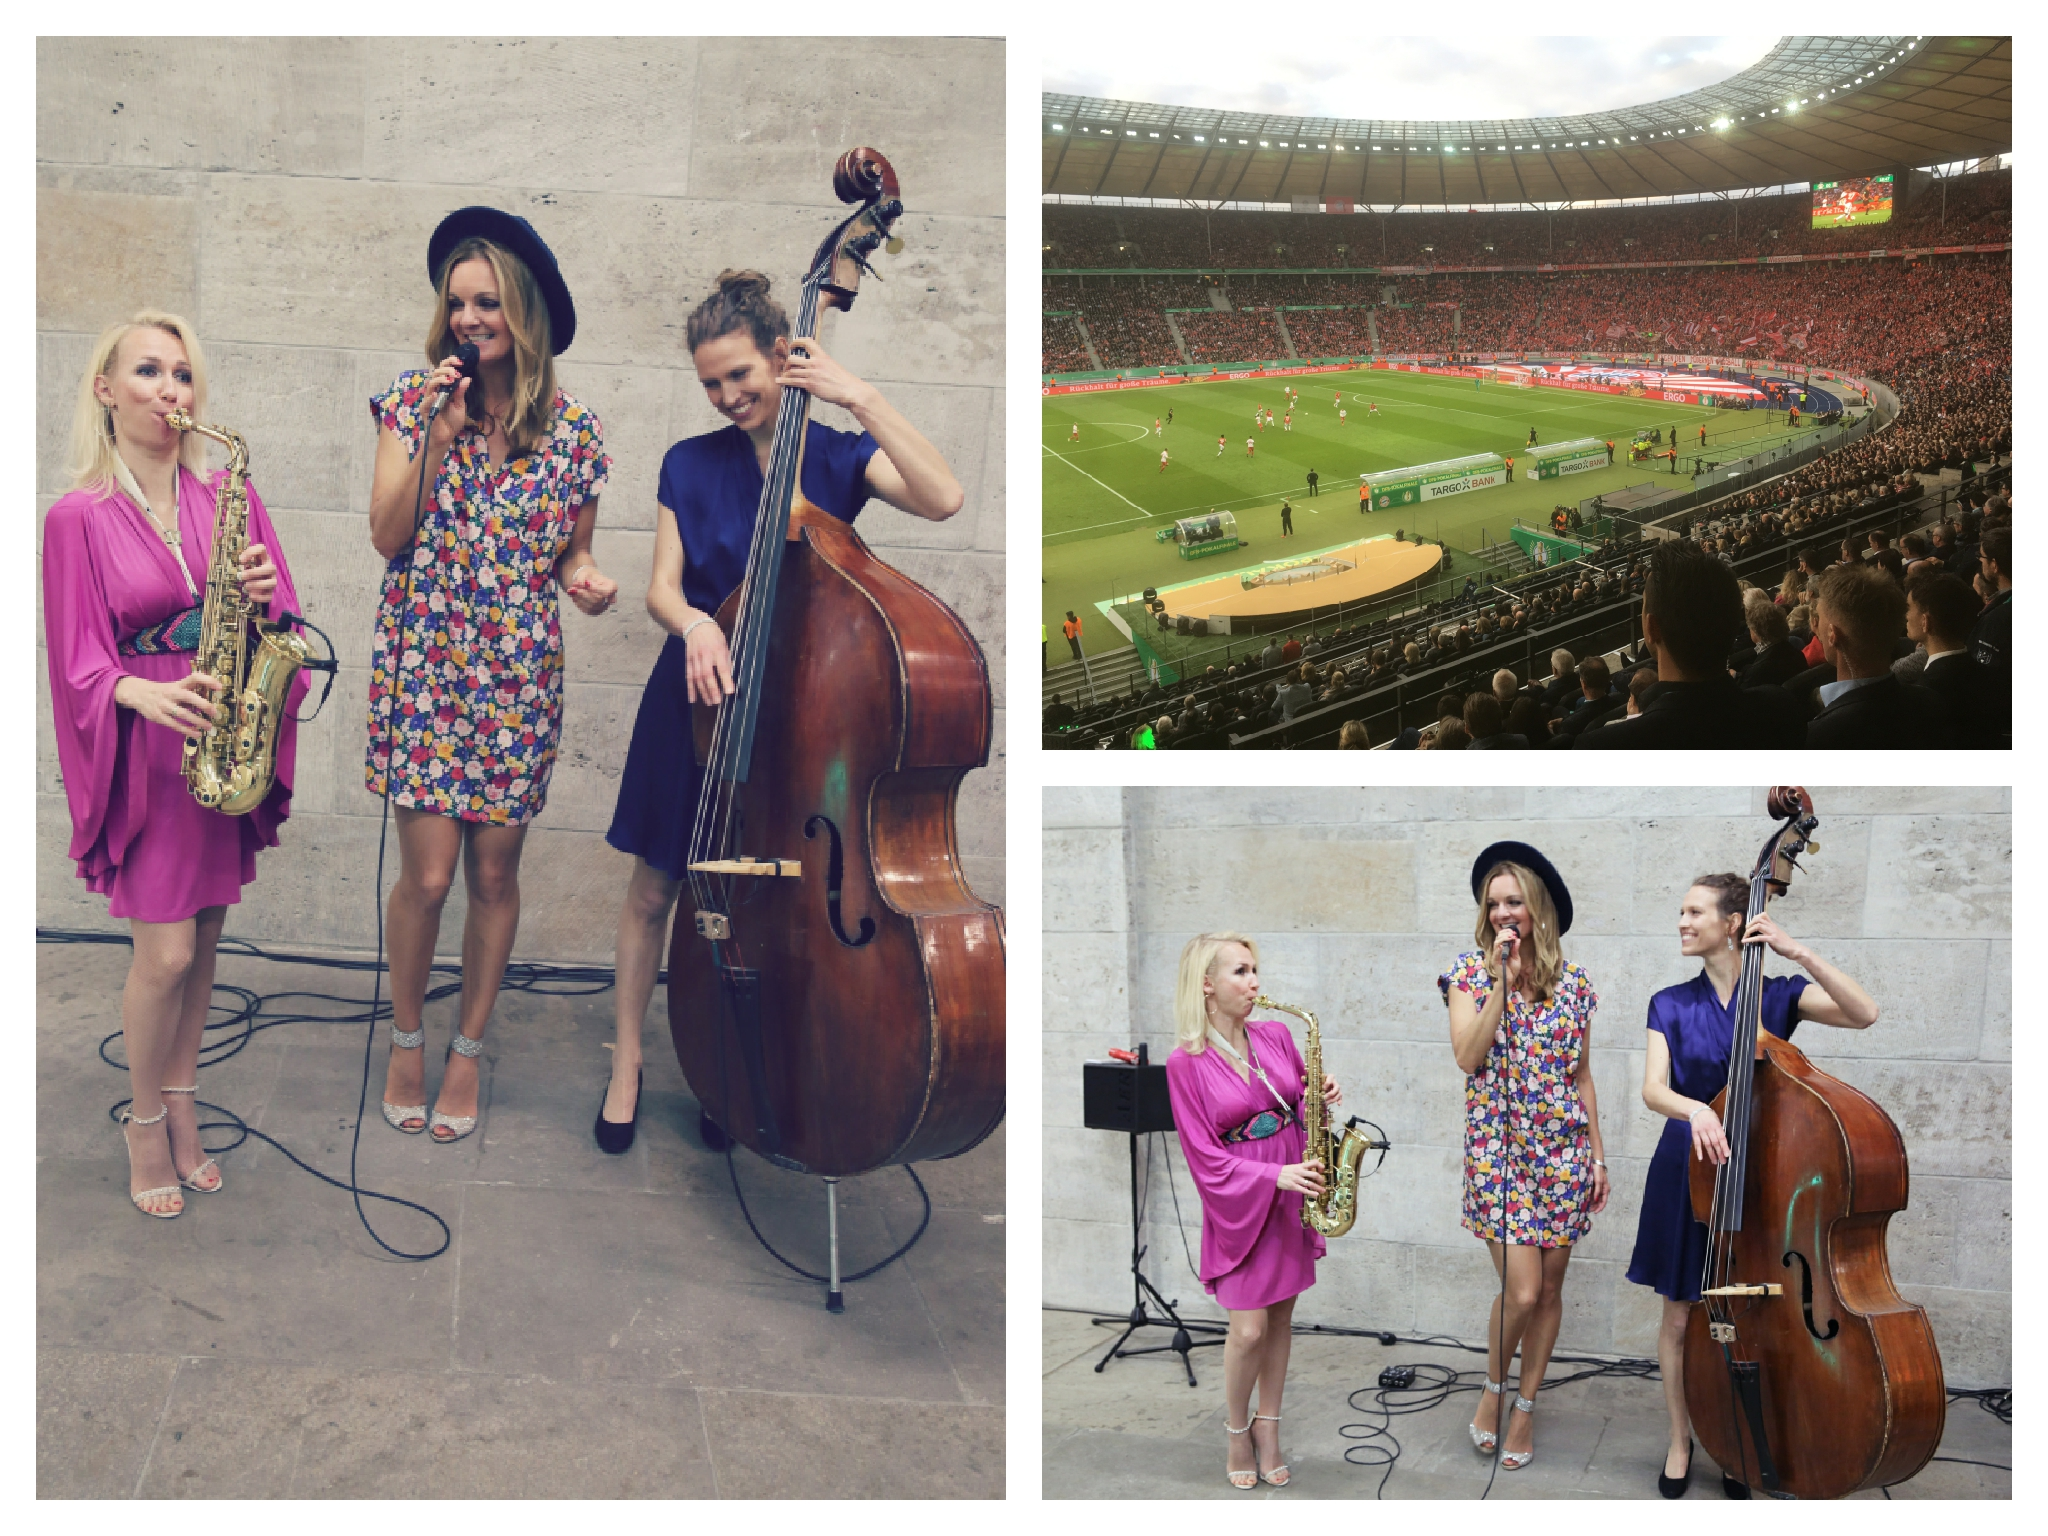 Ladies Band Sunset Orange aus Berlin beim DFB Pokalfinale im Olympiastadion VIP Lounge.